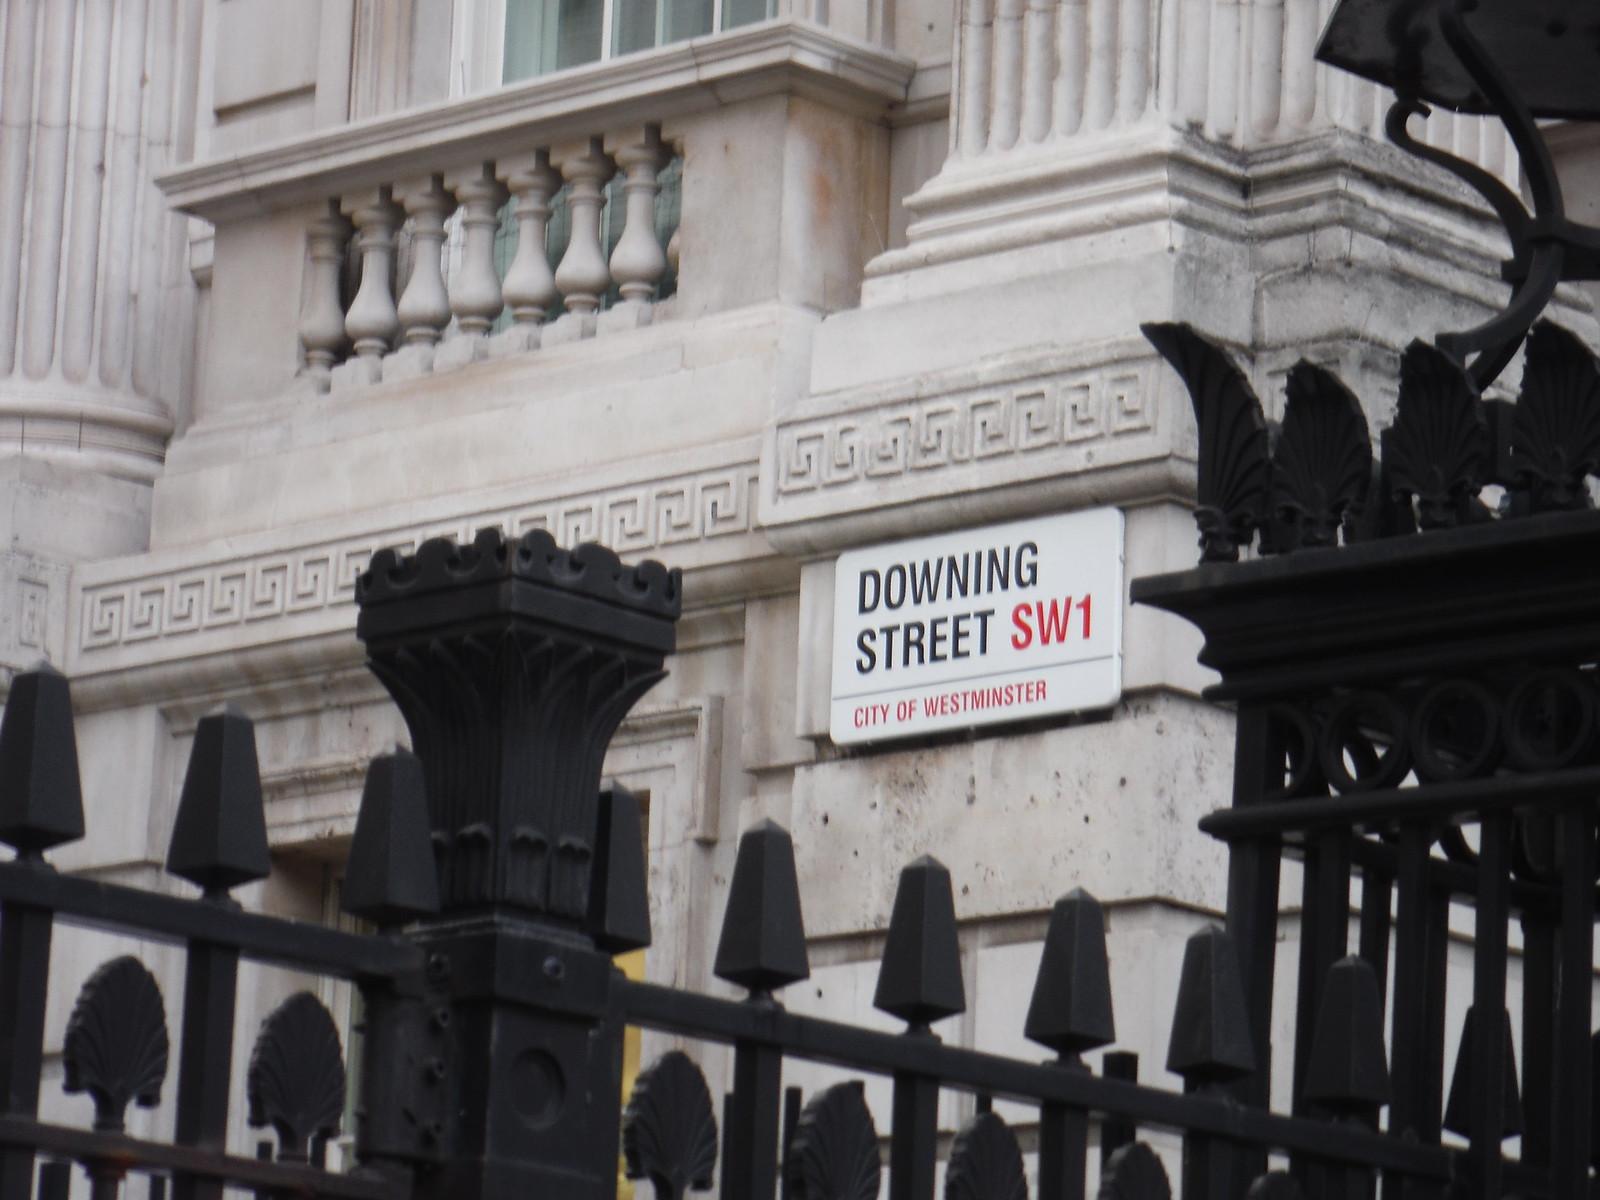 Downing Street SWC Short Walk 19 - Royal Parks